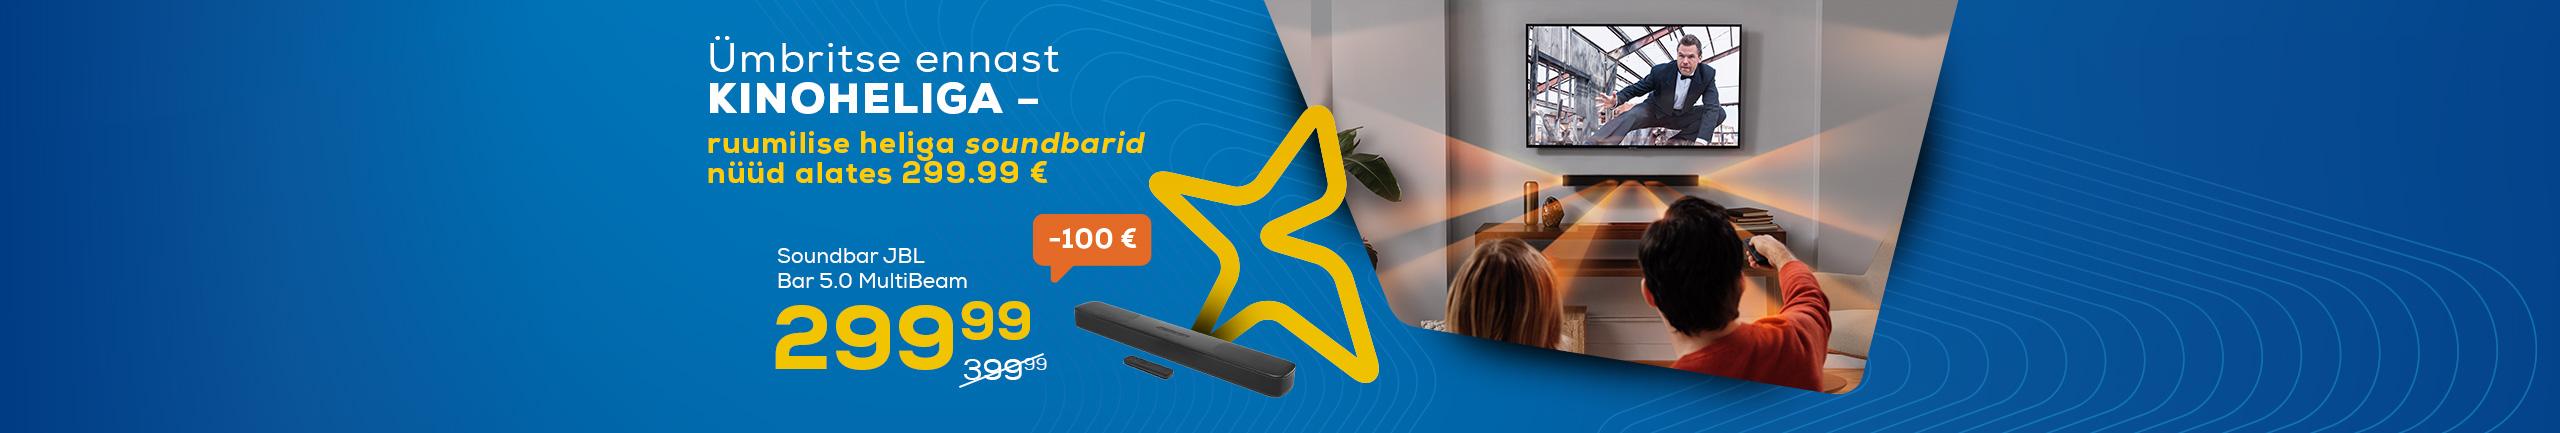 Surrond soundbars now from 299,99€